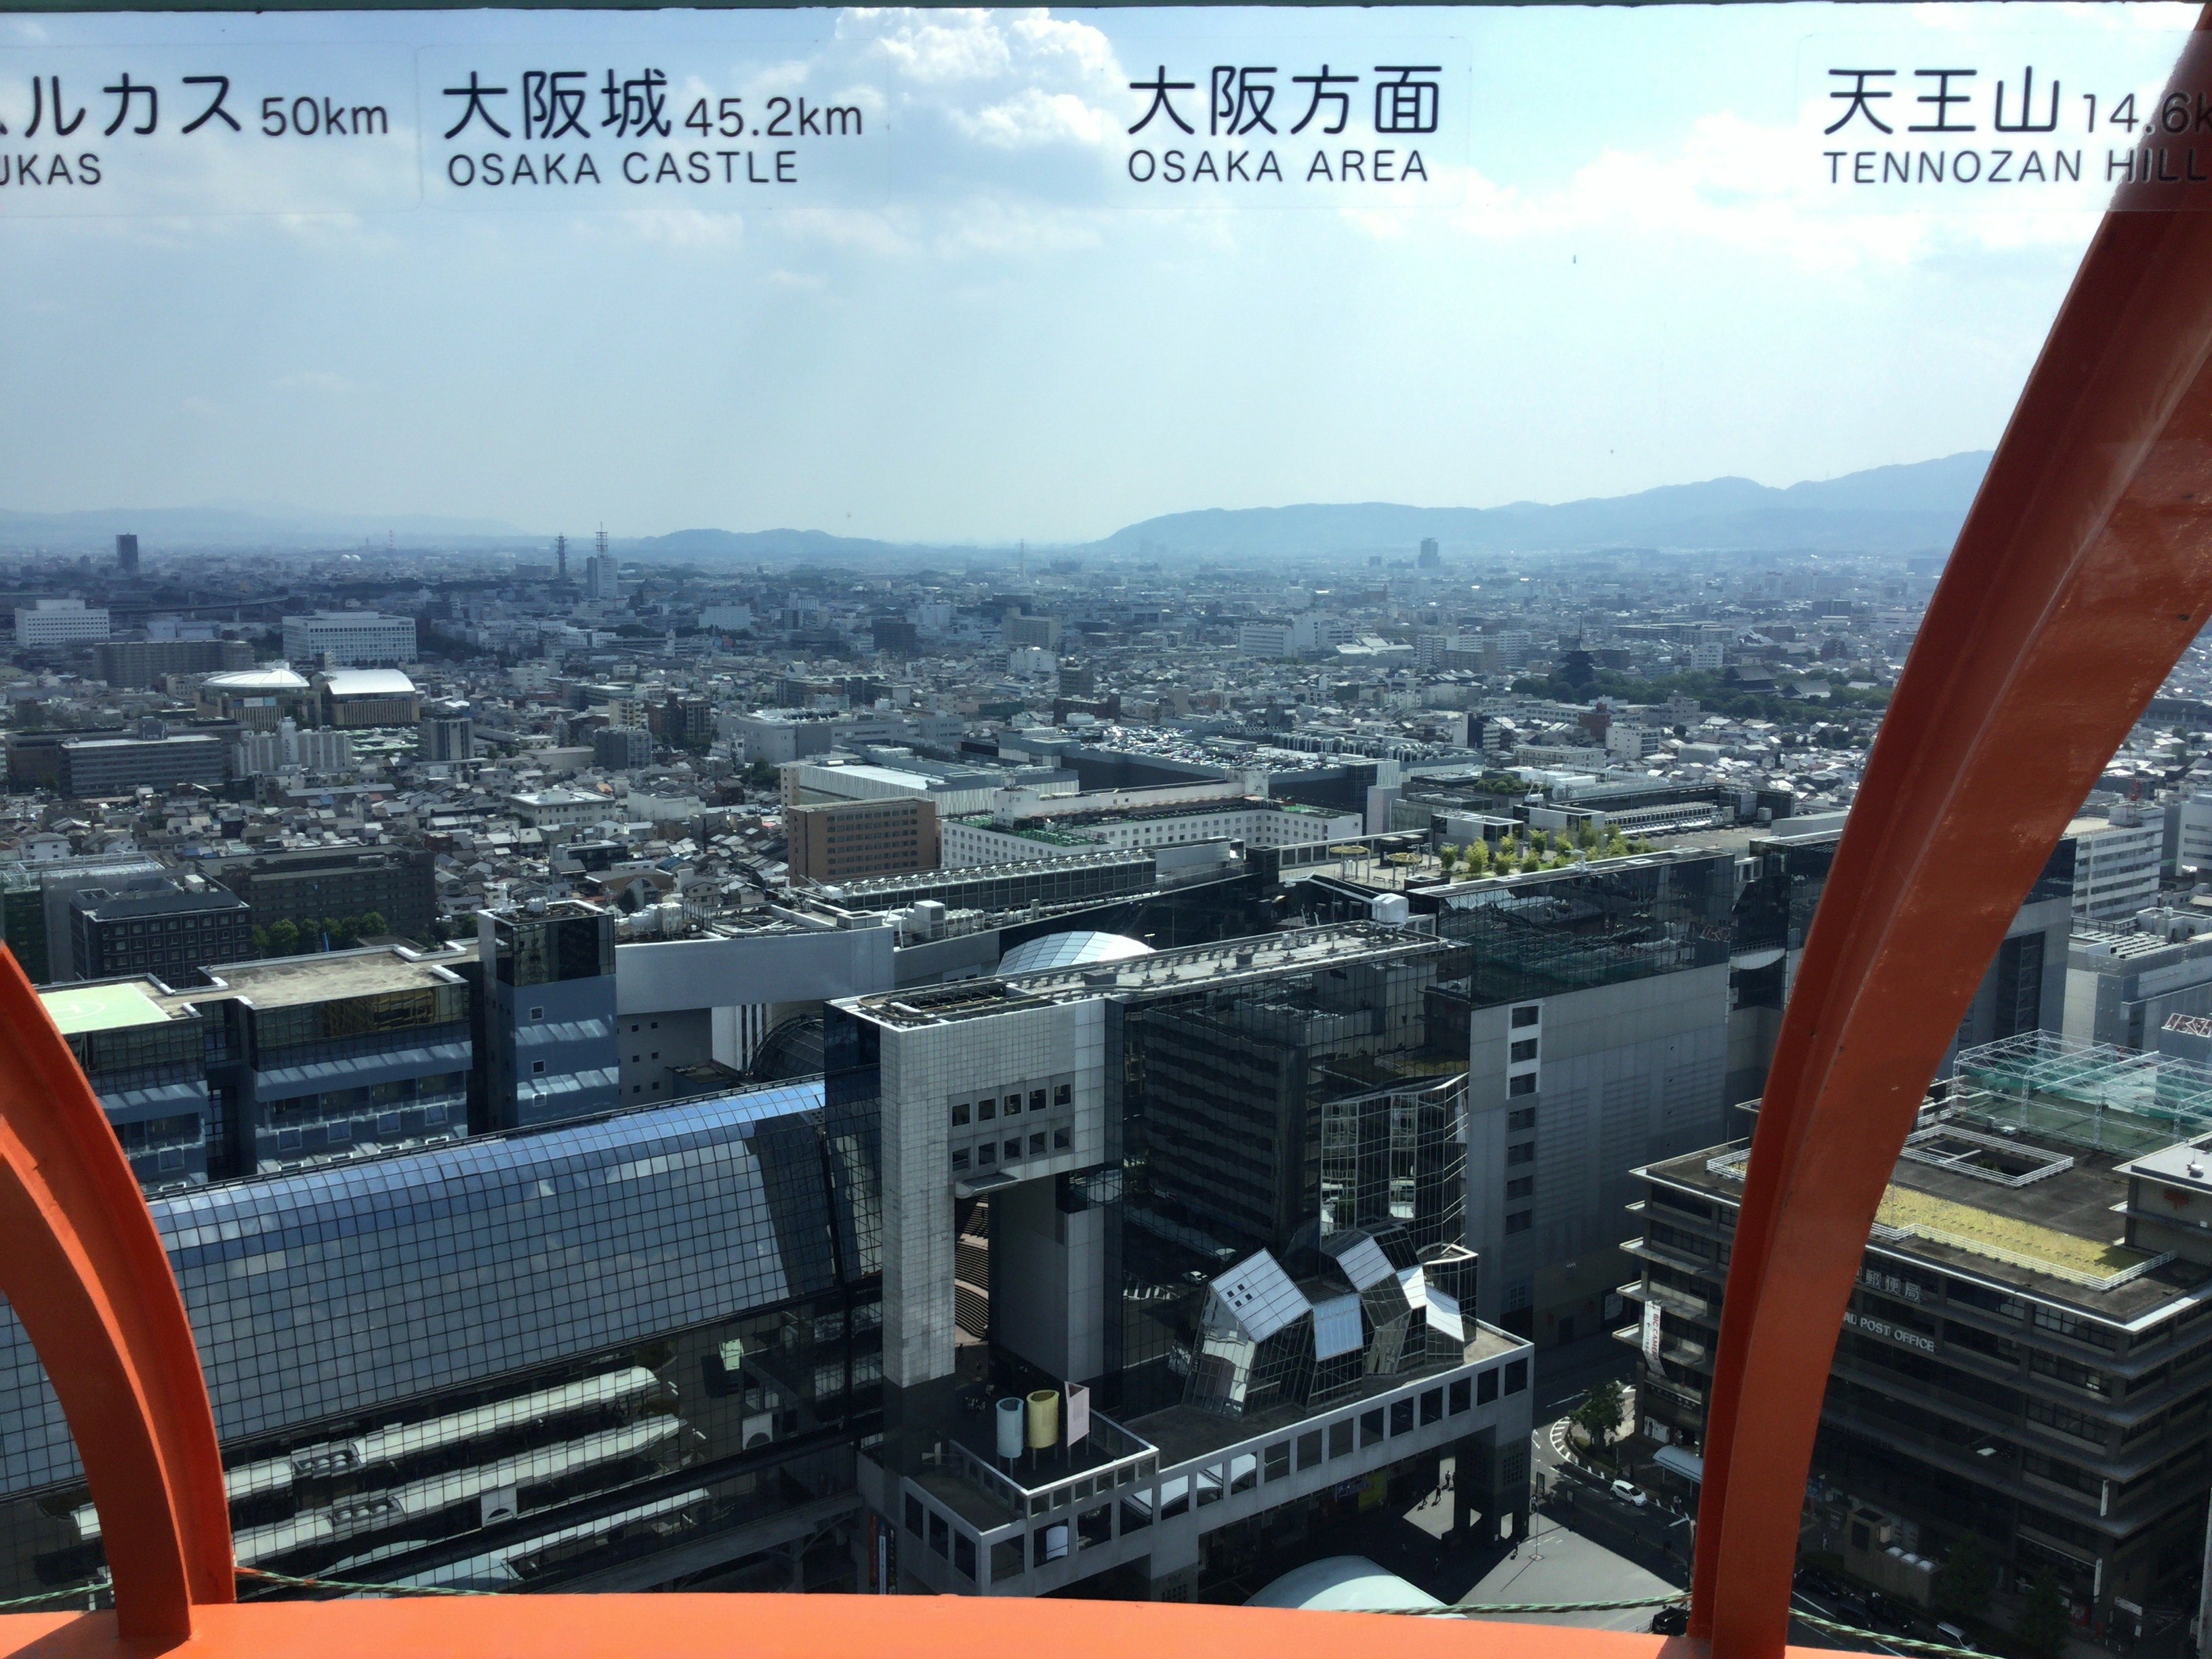 東寺、京都駅、中央郵便局、あべのハルカス、大阪城、天王山、大阪方面